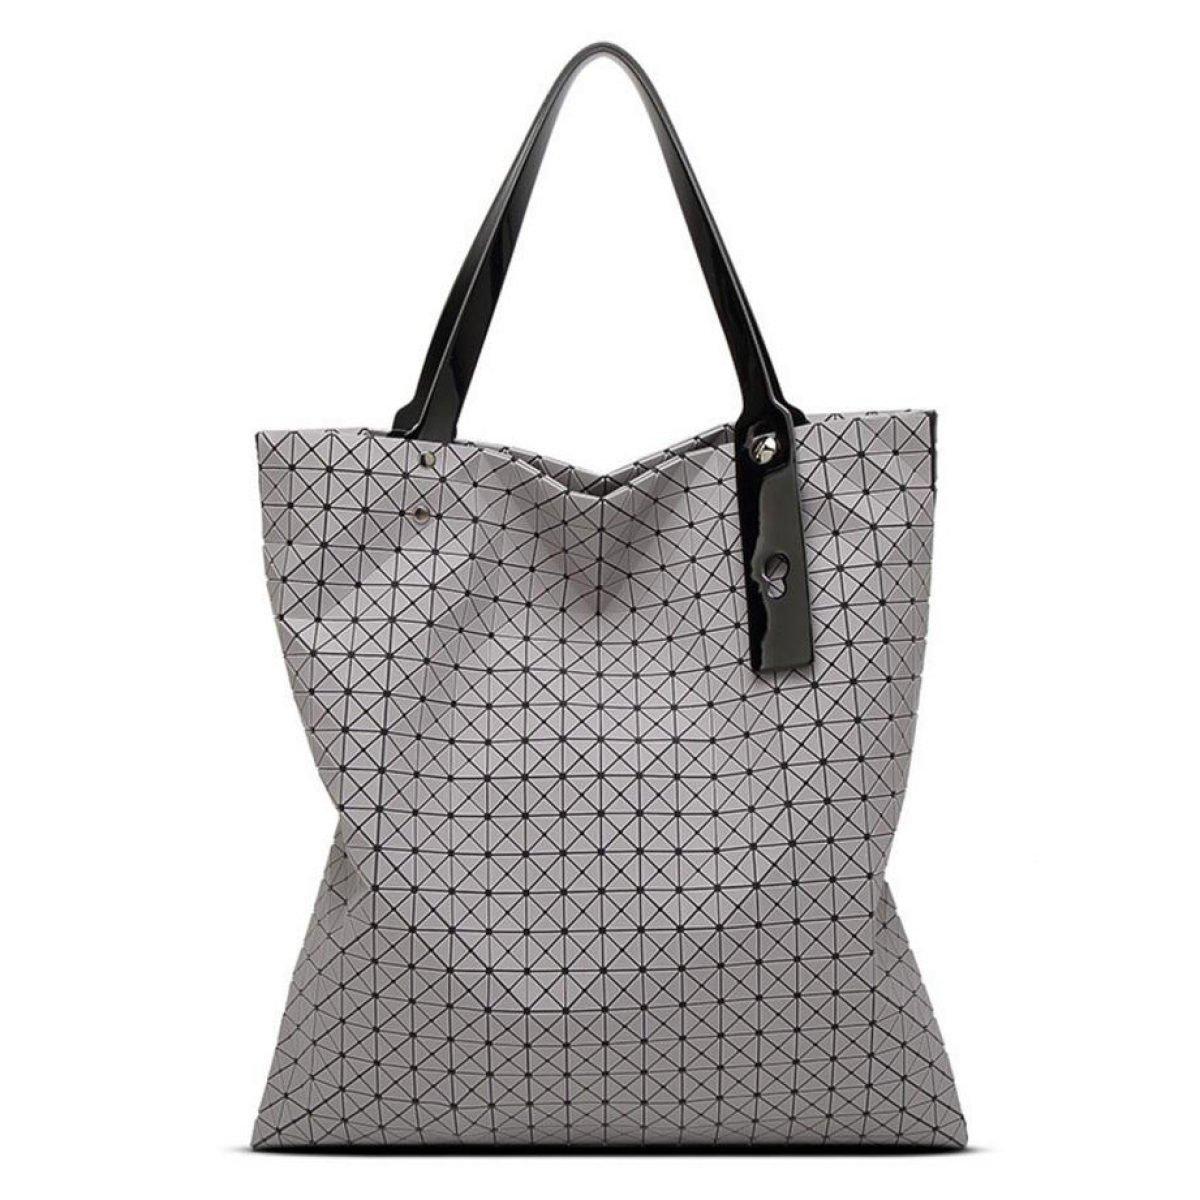 Silikon 21 X 21 Handtasche Geometrie Falten Dame Umhängetasche Koreanische Version Trendy Dreieck Ling Tasche,Blue-OneSize CHENGXIAOXUAN